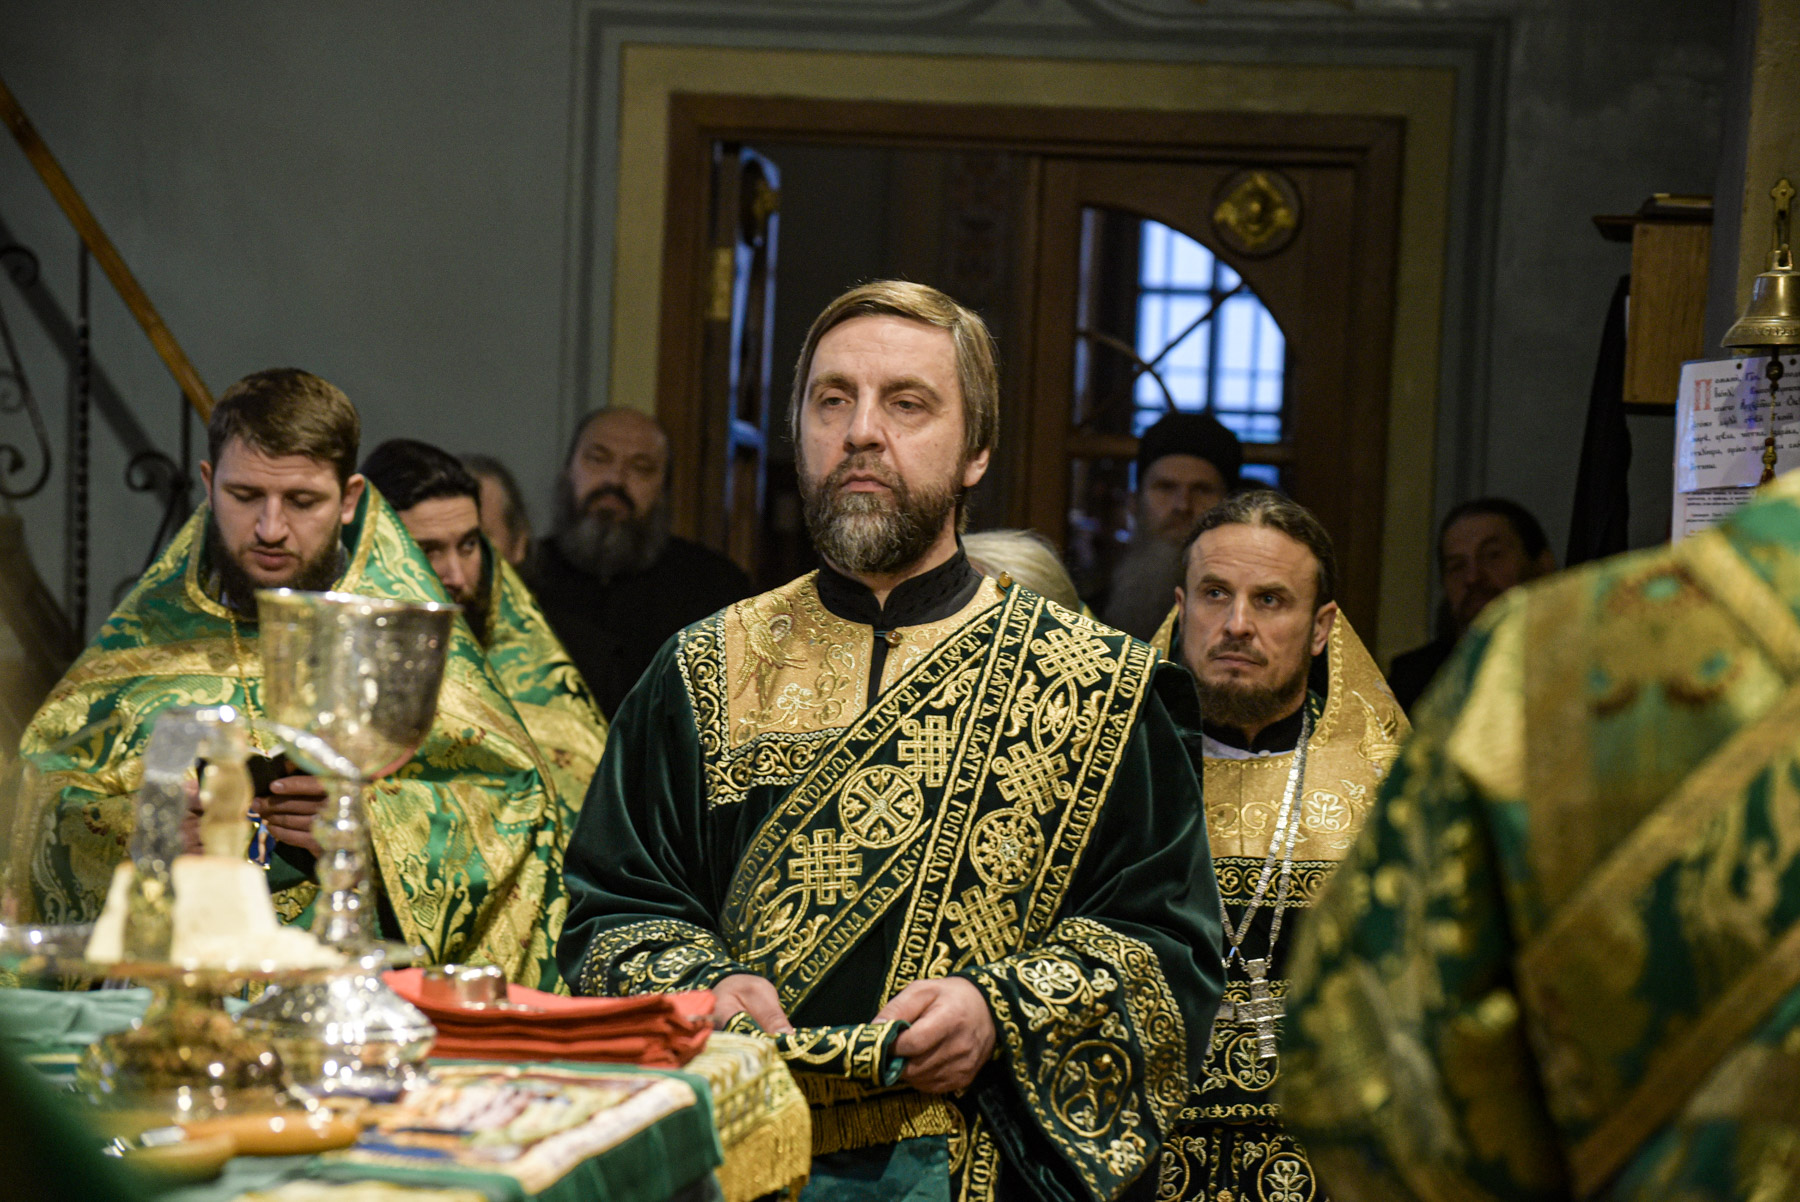 photos of orthodox christmas 0190 2